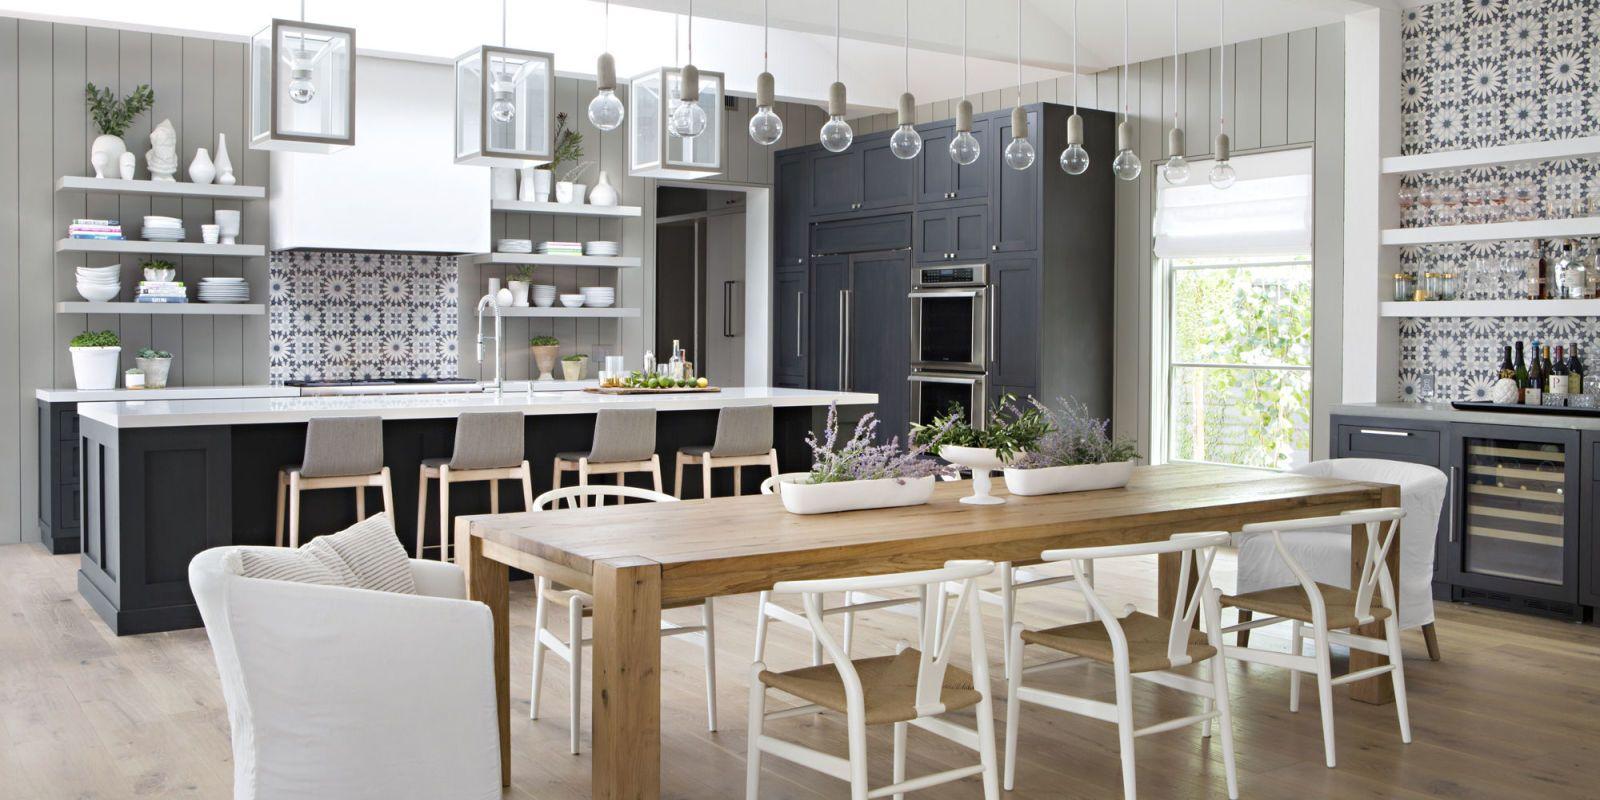 A Farmhouse Kitchen By Raili Clasen and Eric Olsen Modern